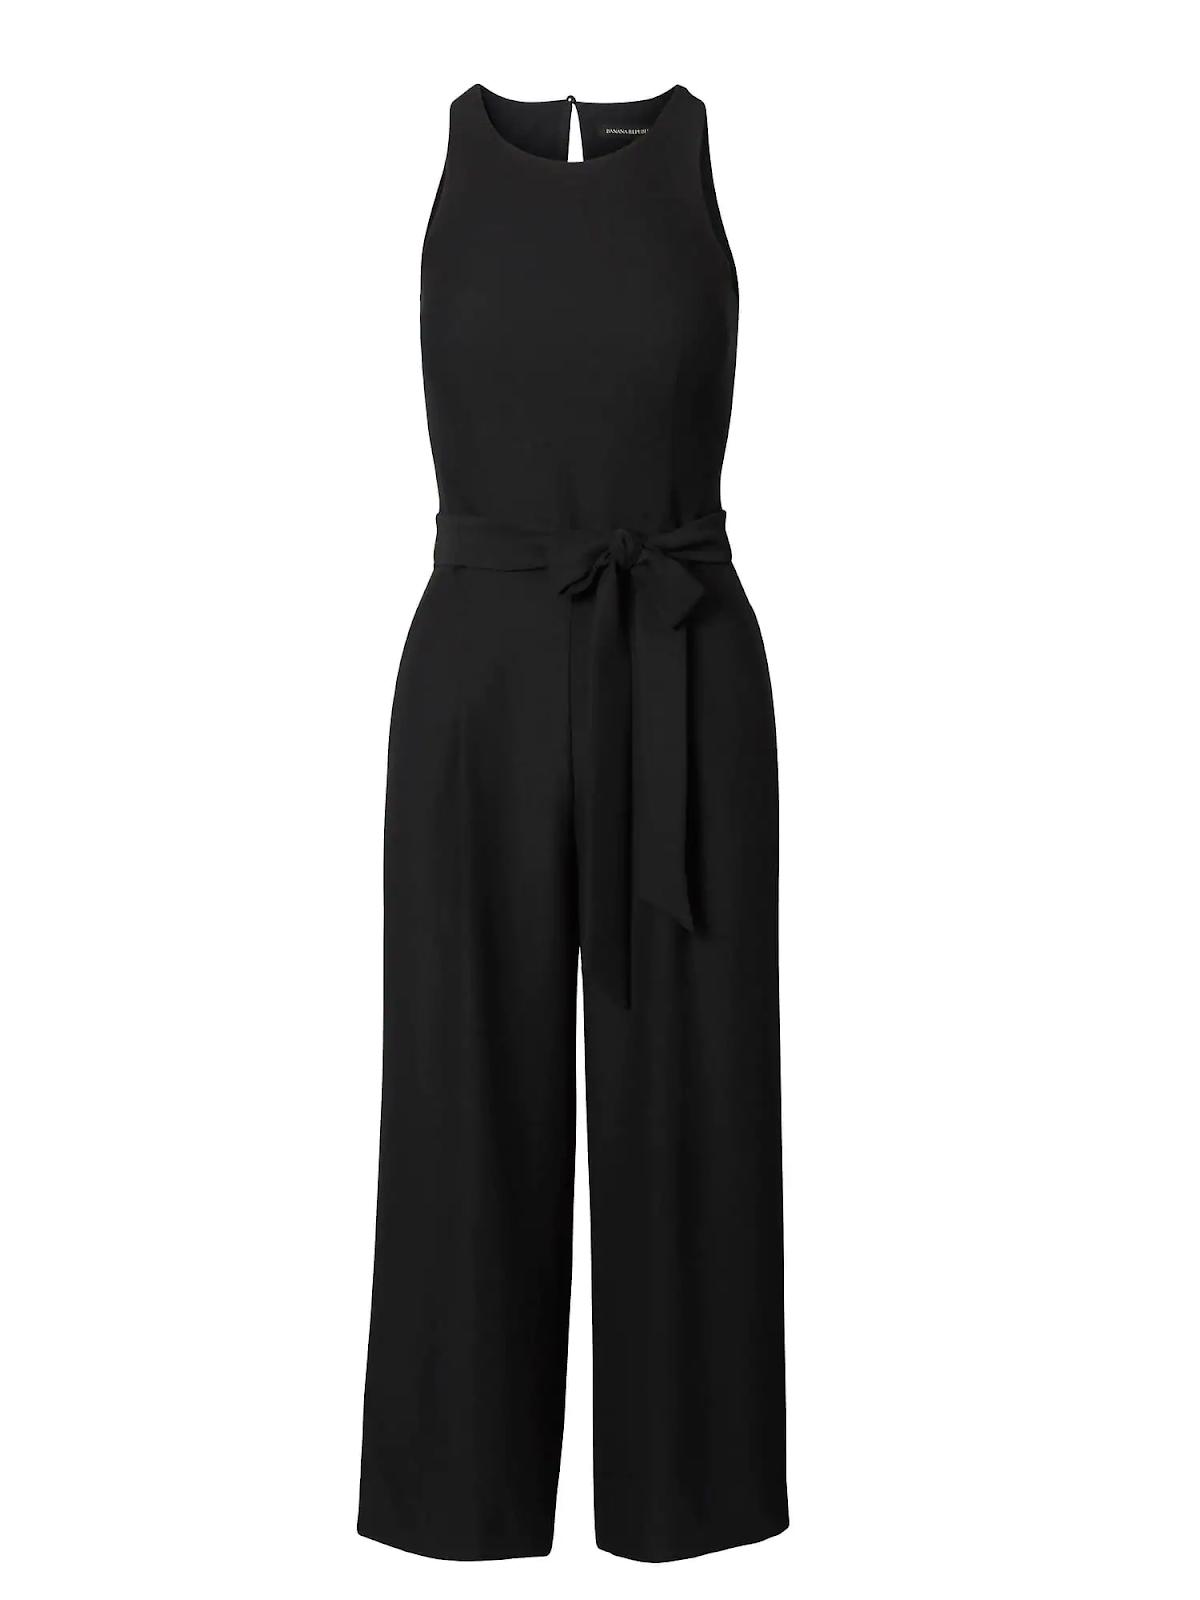 Slimming Black Sleevless Jumpsuit - Banana Republic